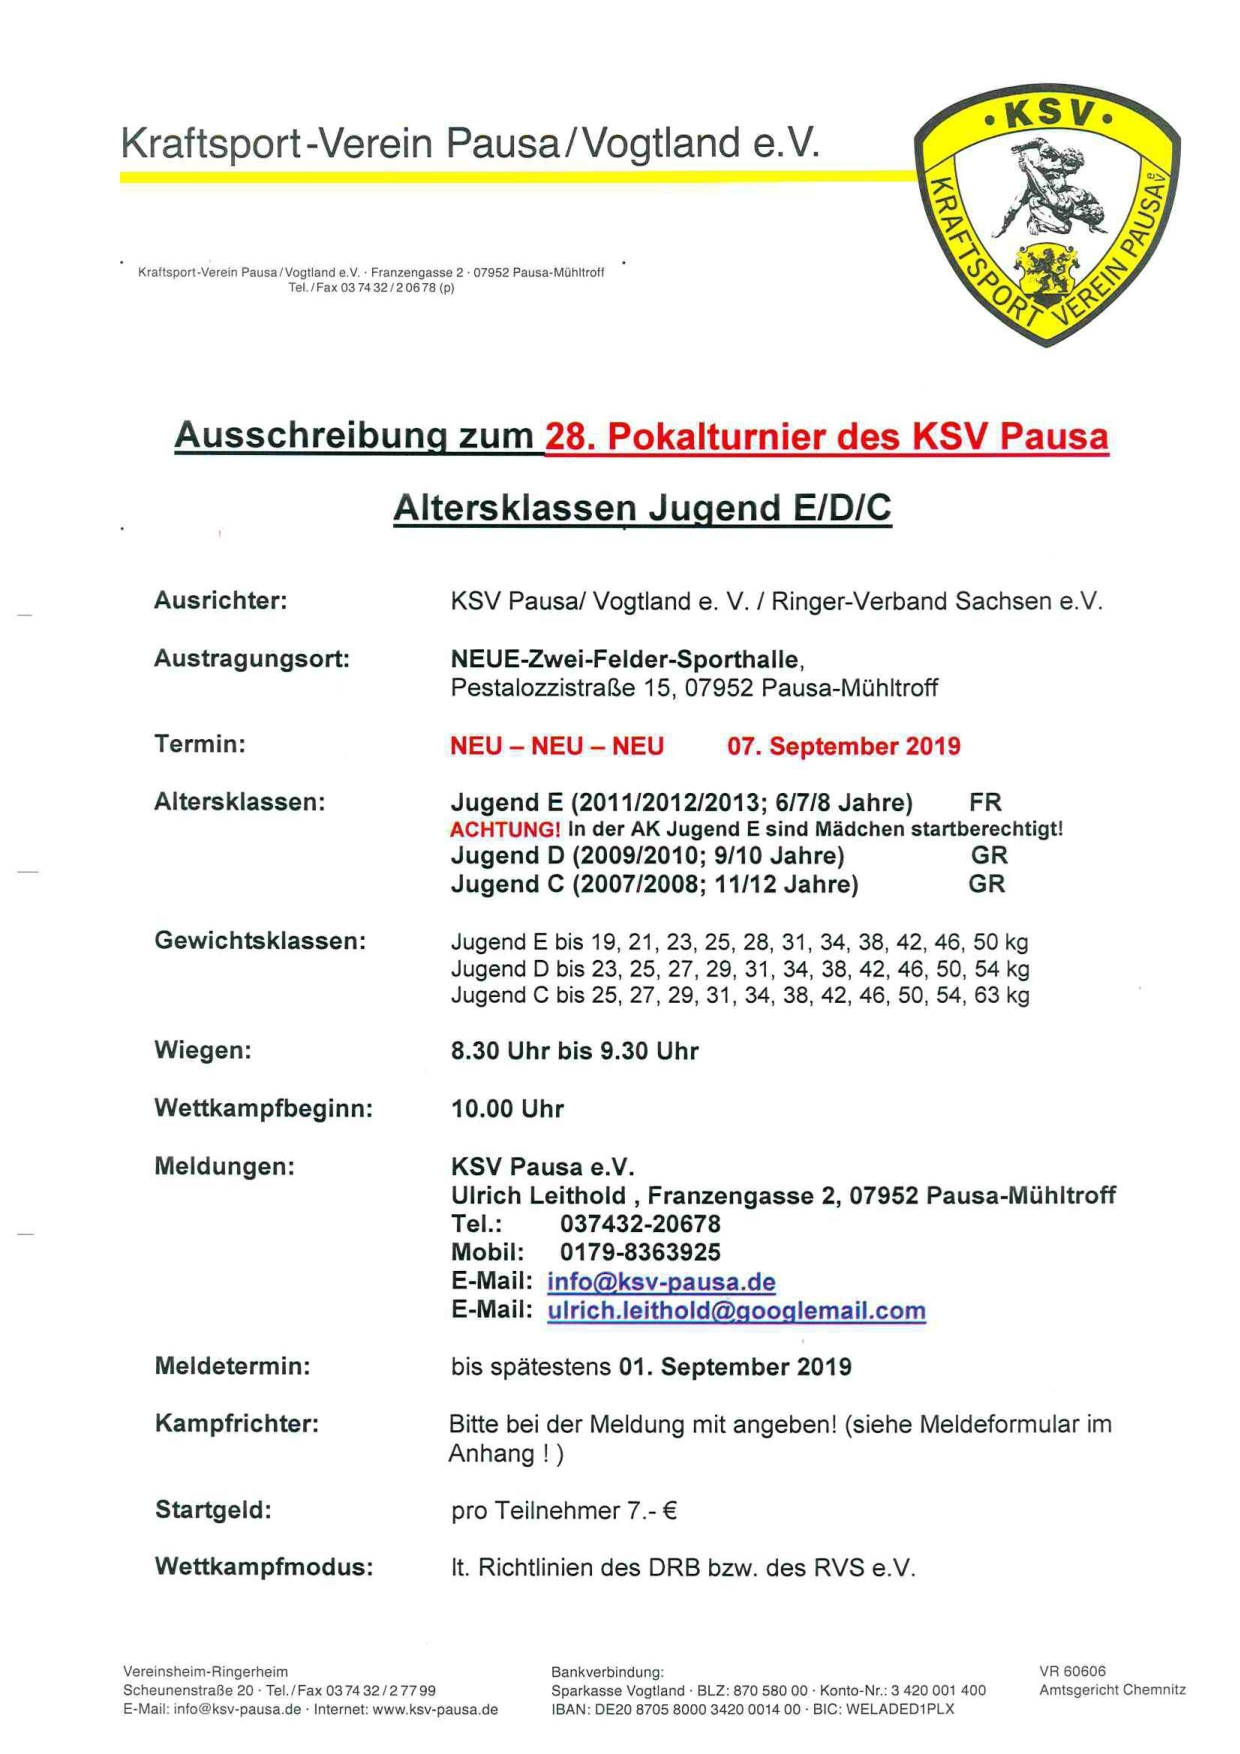 28. KSV-Pokal Pausa